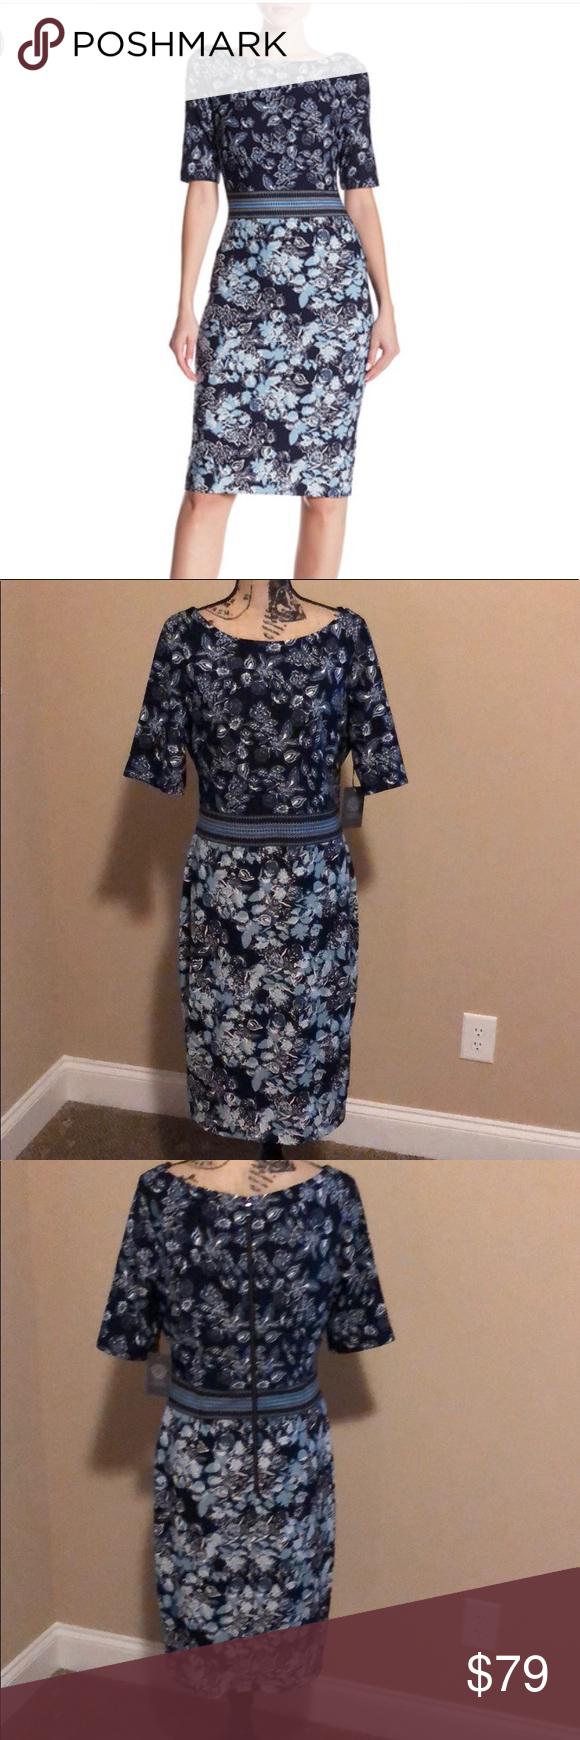 987d42a83cfb7 Flash Sale🎈Vince Camuto size 14 NWT dress NWT Vince Camuto Dresses ...